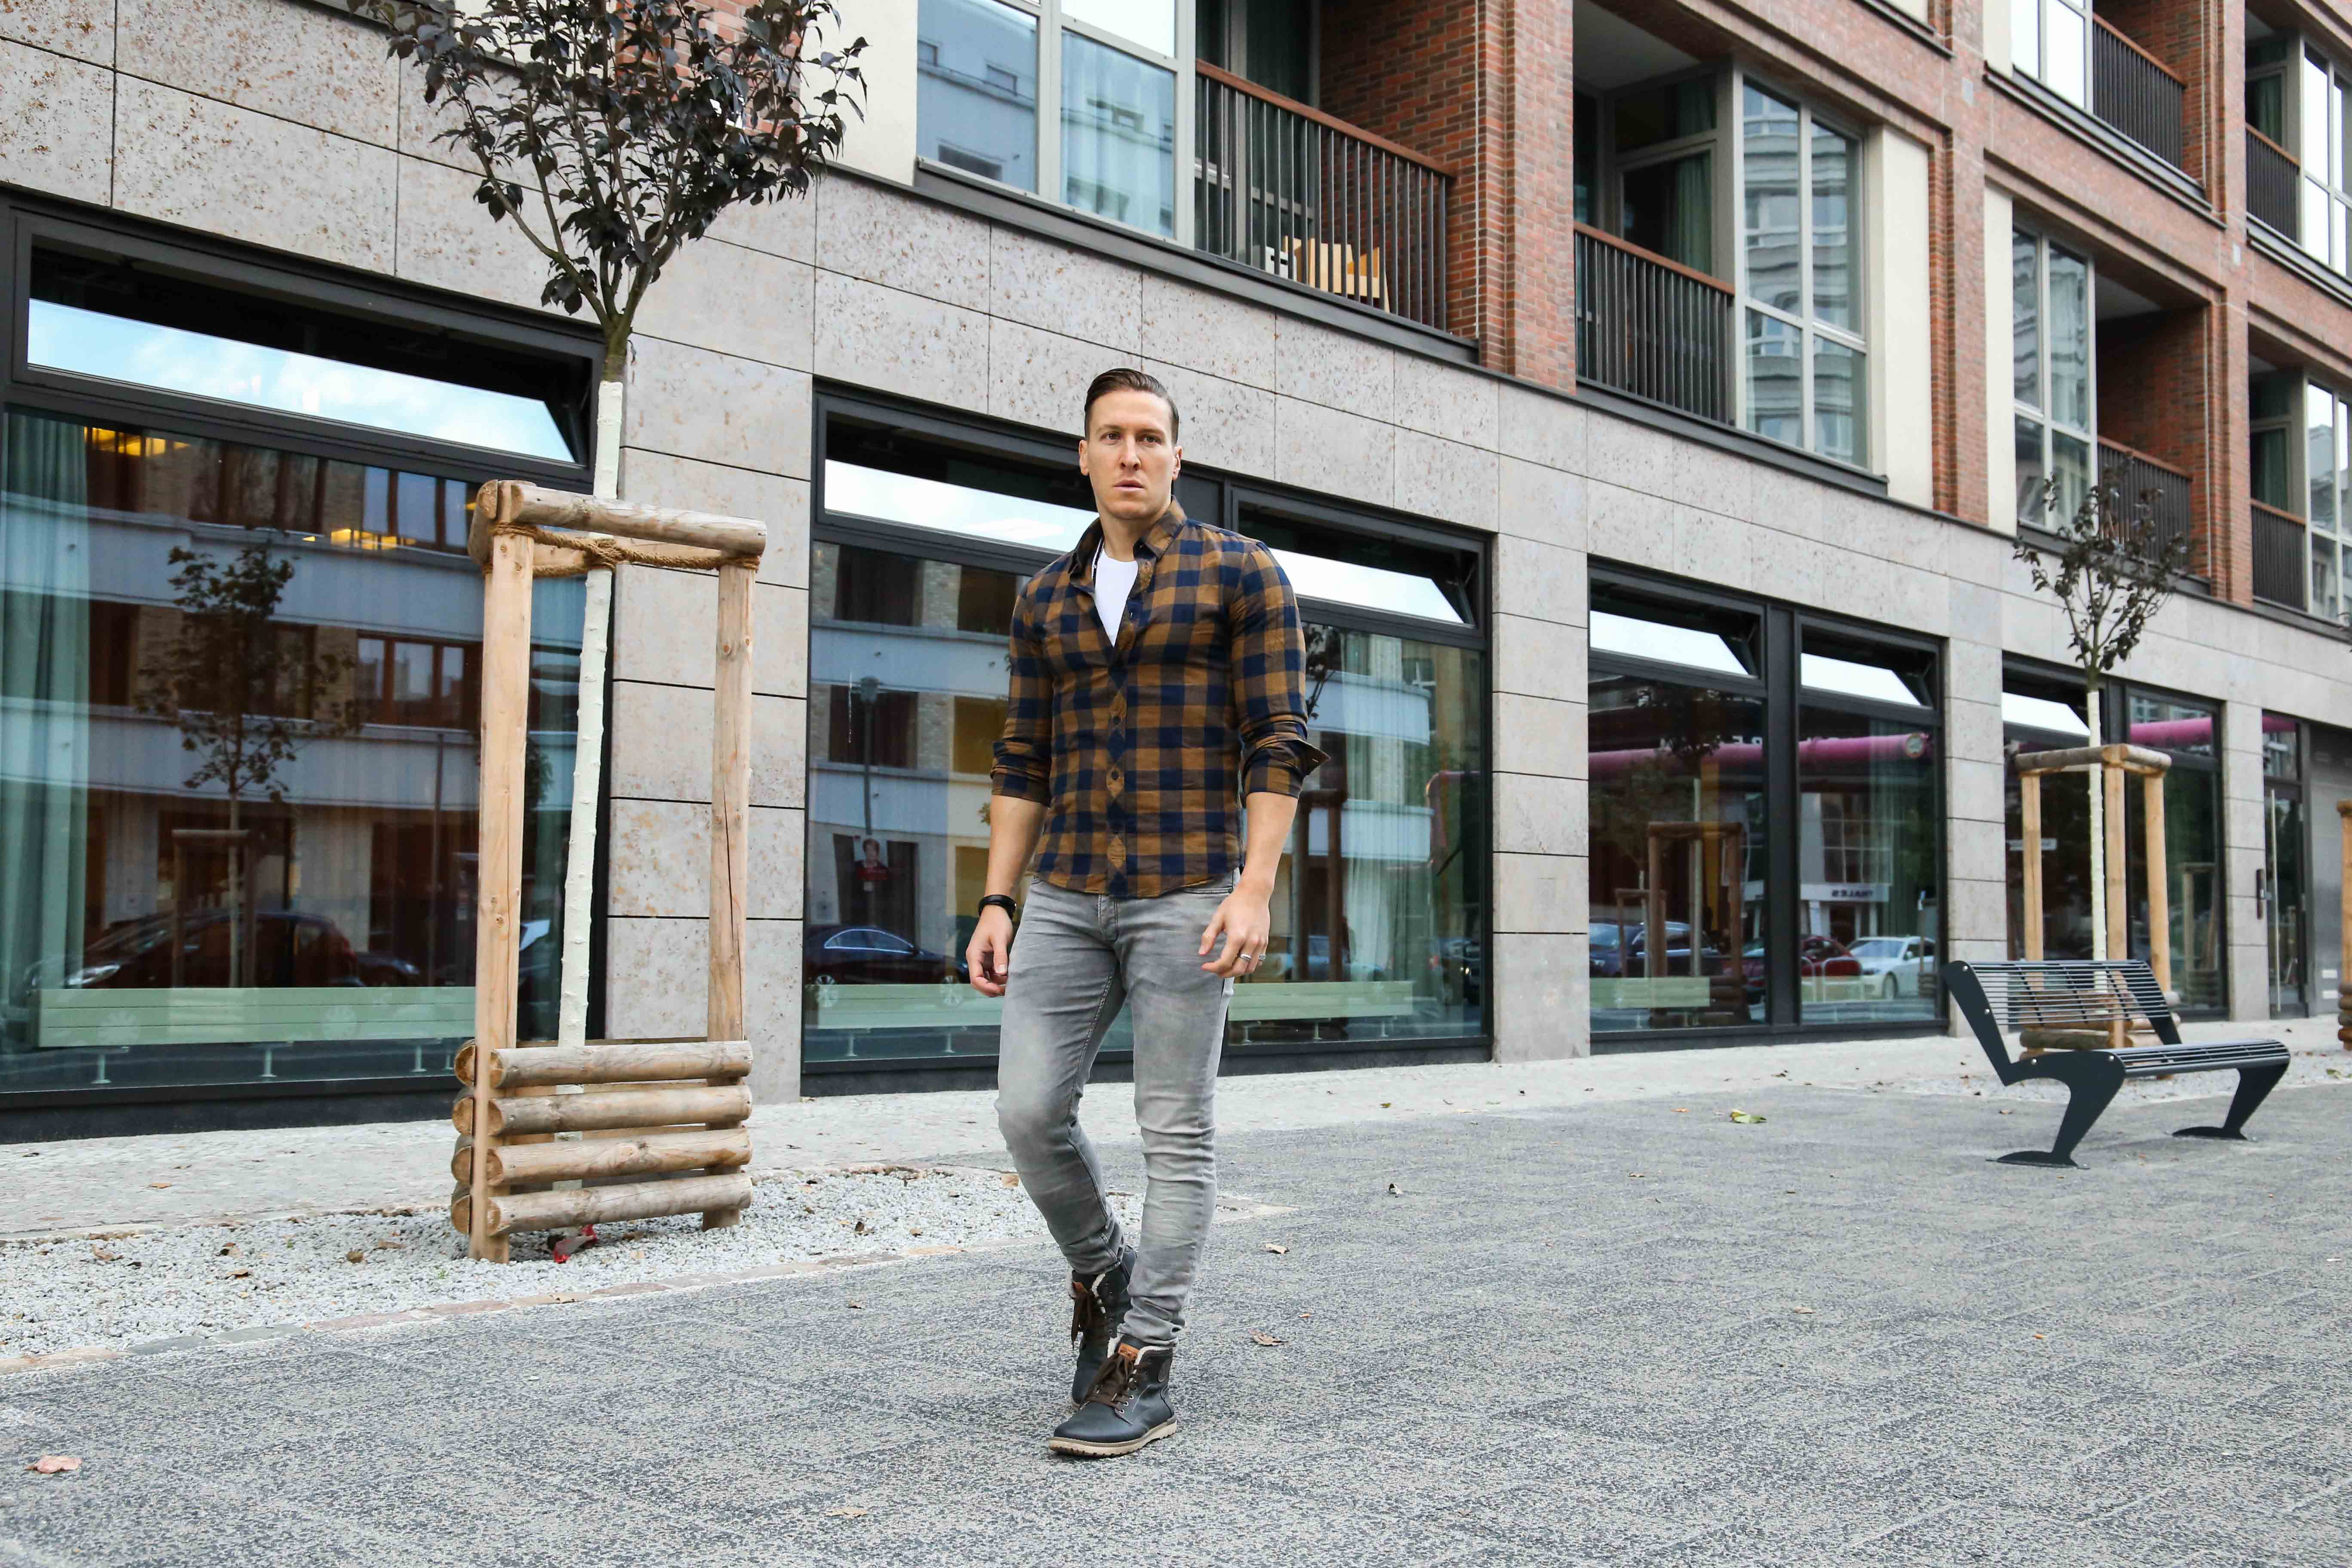 lässiger-herbstlook-graue-jeans-braunes-holzfällerhemd-modeblog-fashionblog-fashion-blogger-berlin_1616